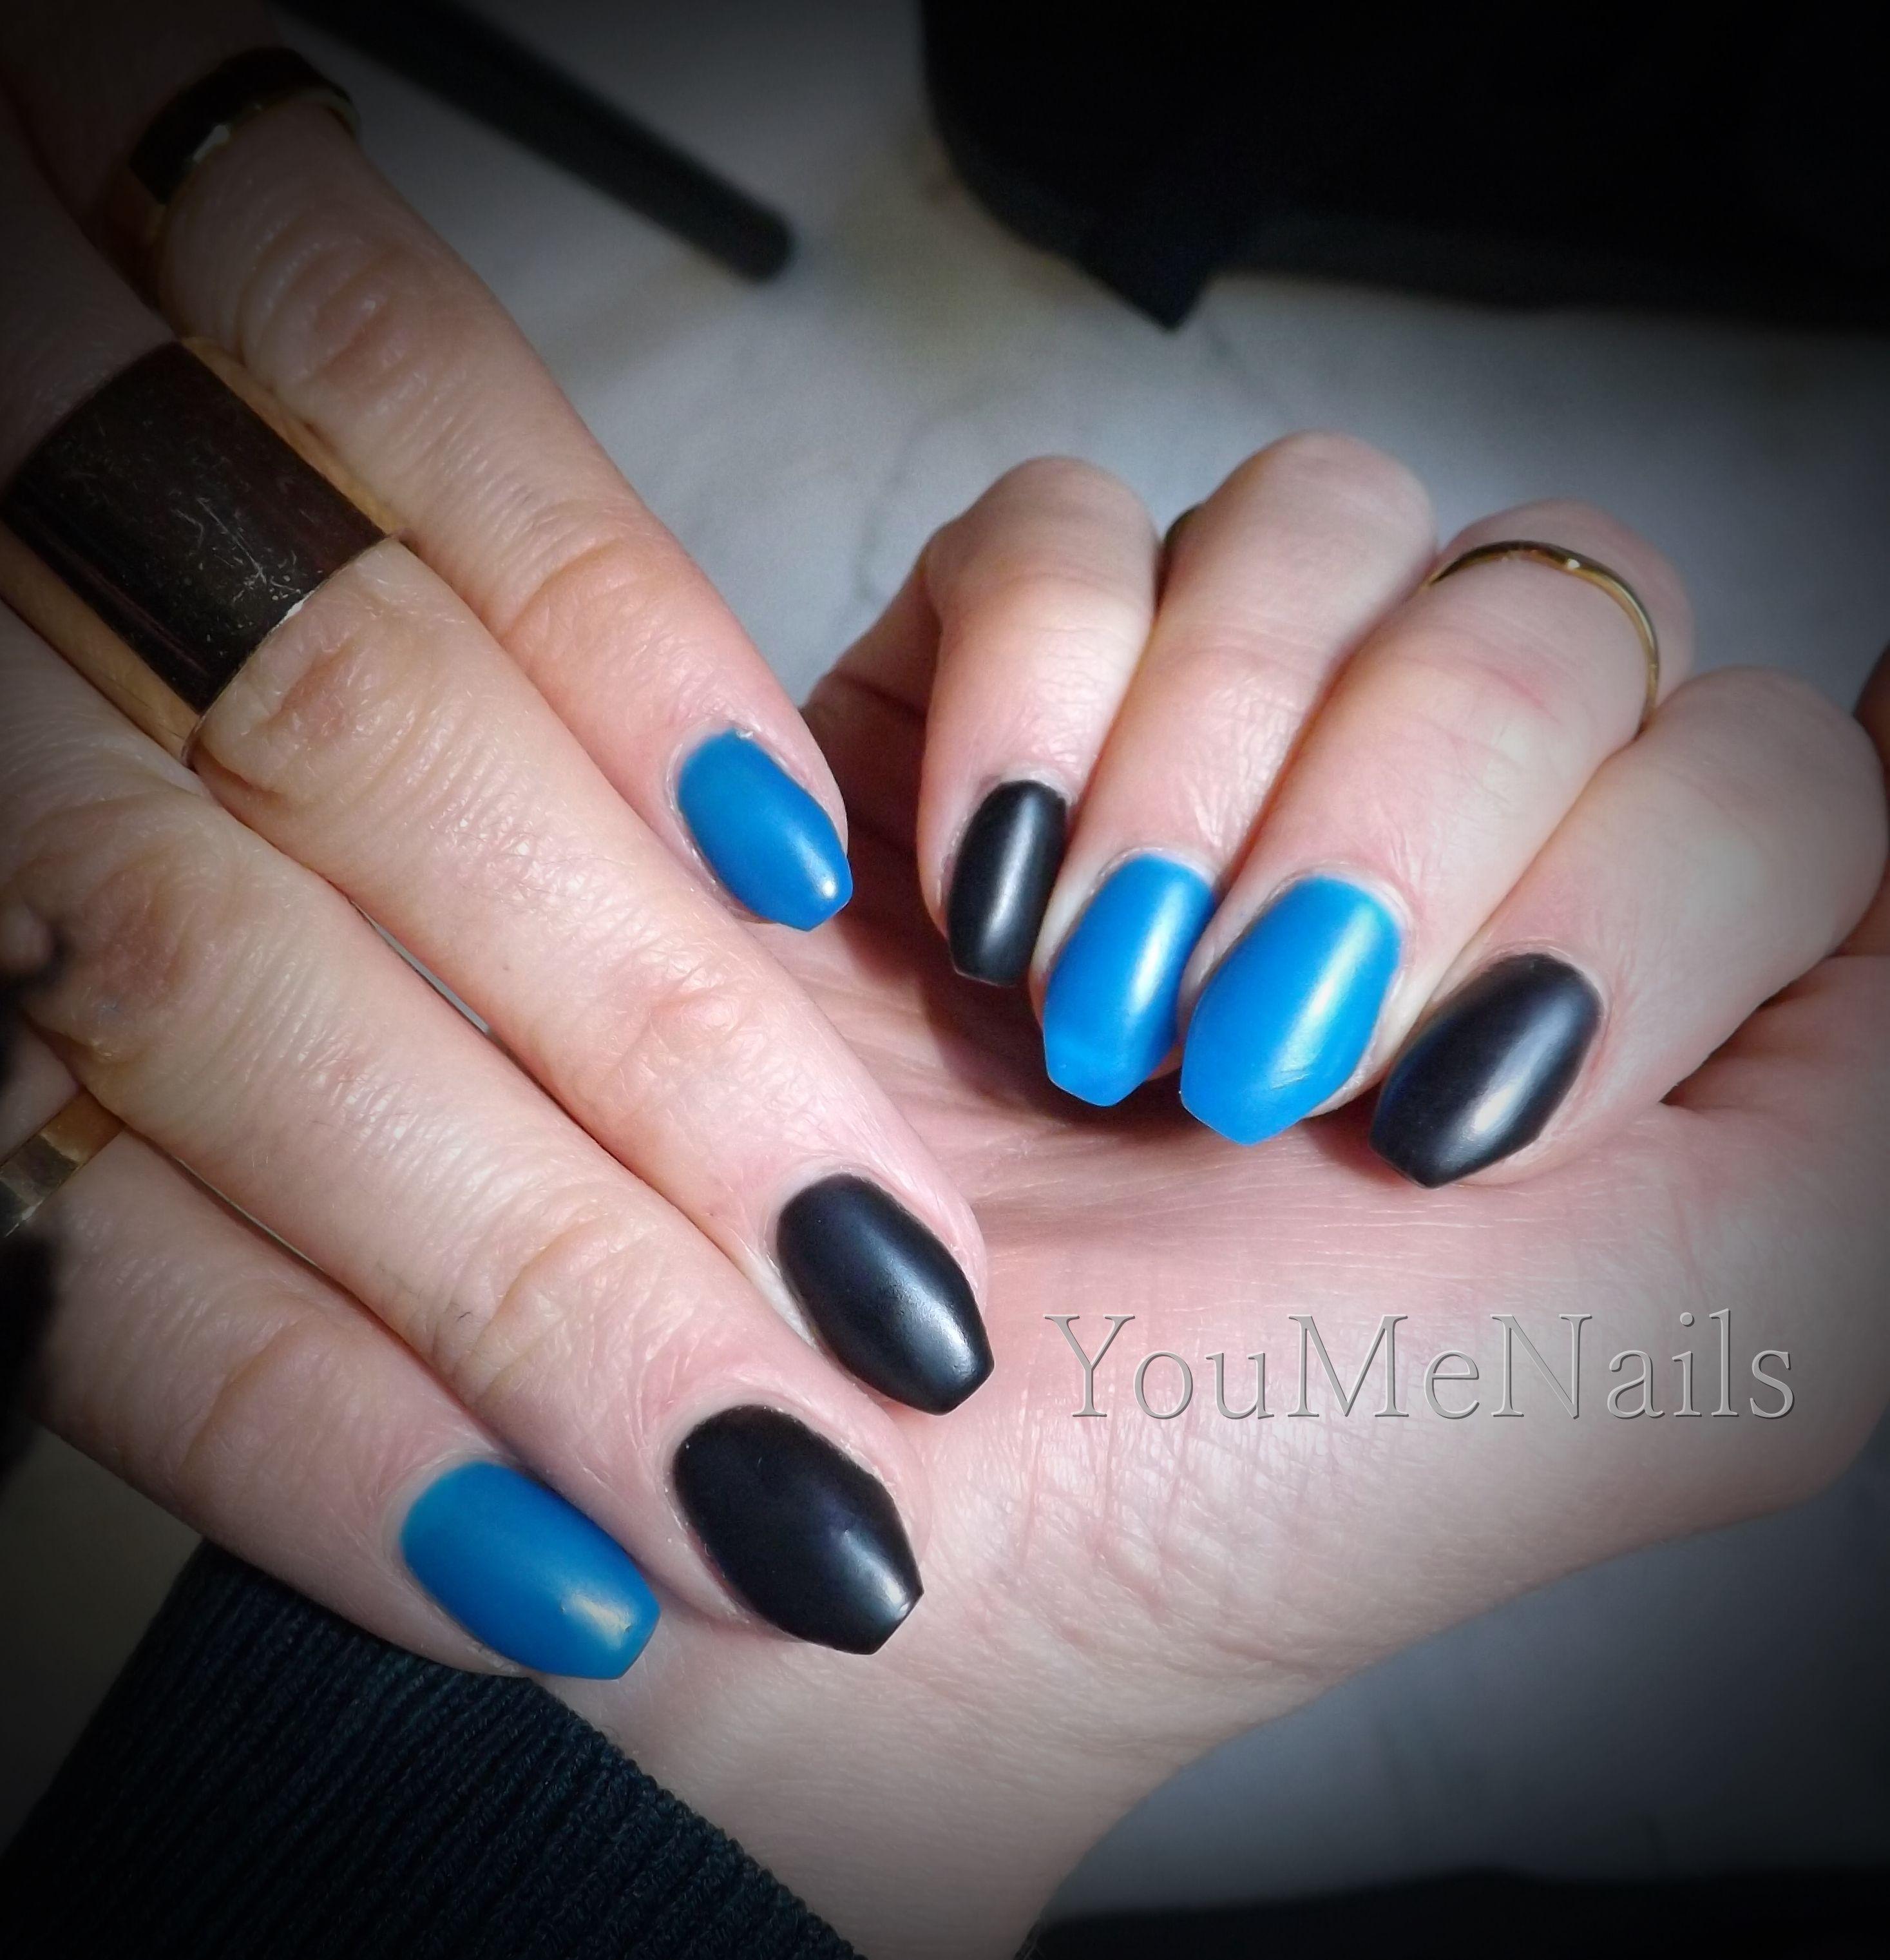 Matte Mattenails Nails Nail Bleu Bluenails Blue Manucure